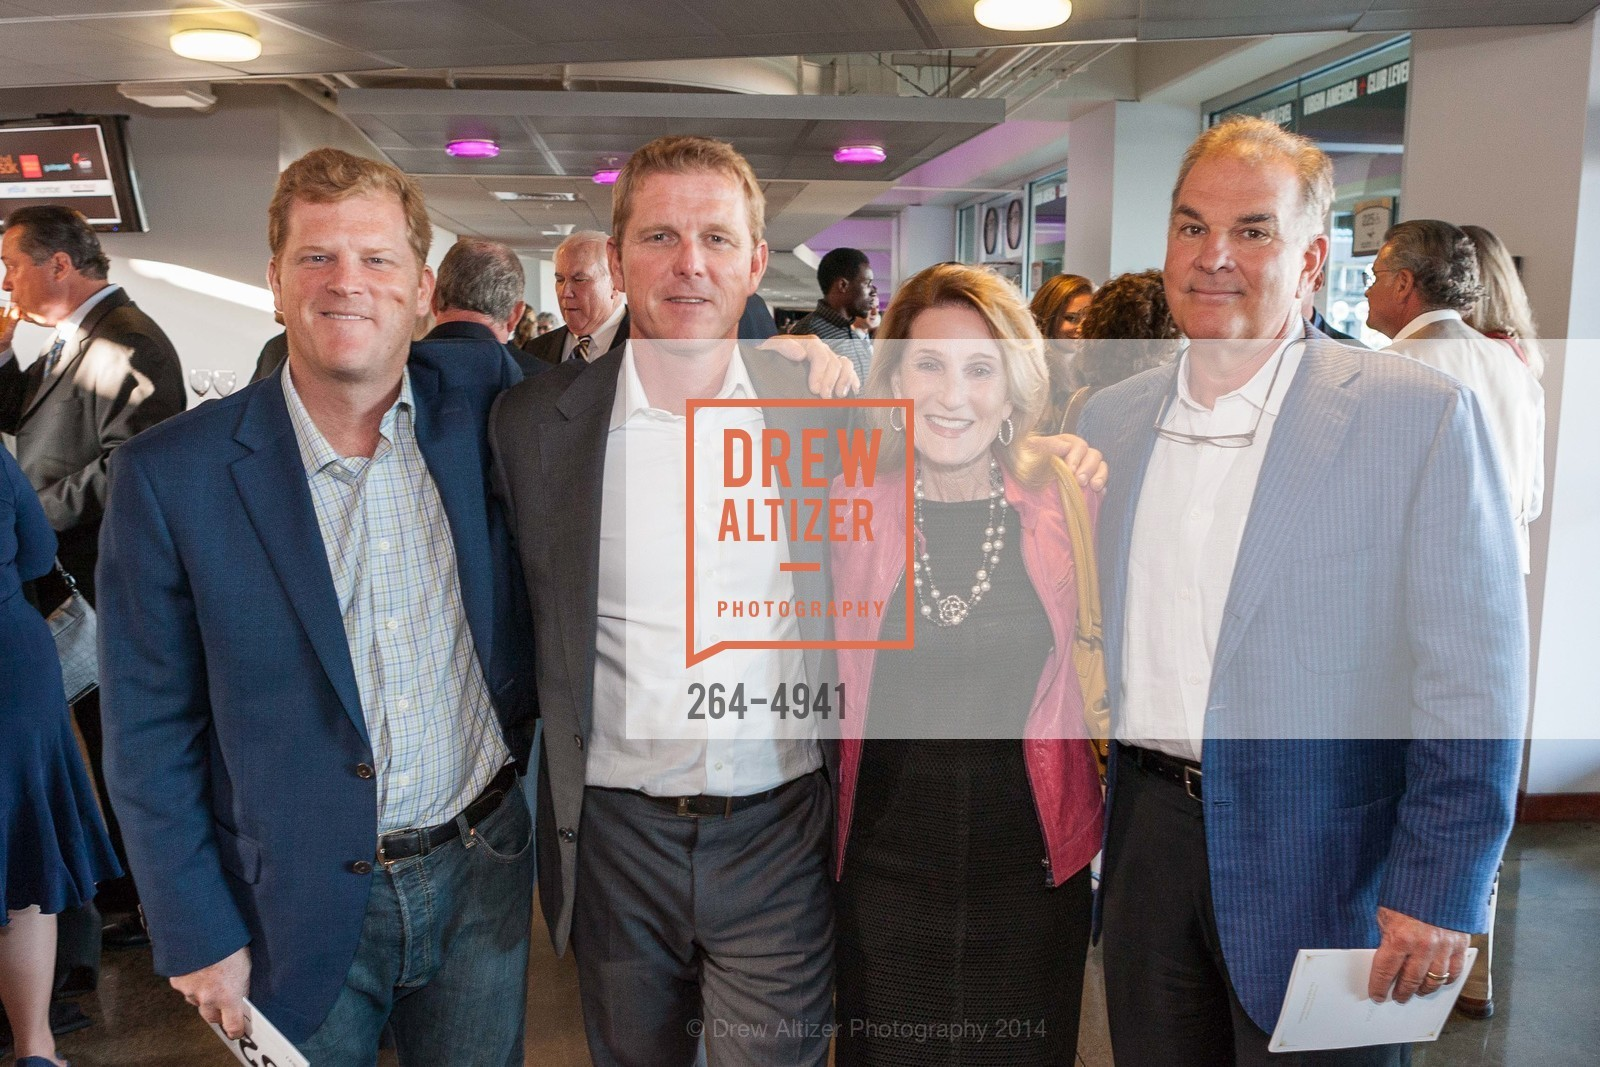 Bill Meyer, Andy Meyer, Lorna Meyer-Calas, Dennis Calas, Photo #264-4941